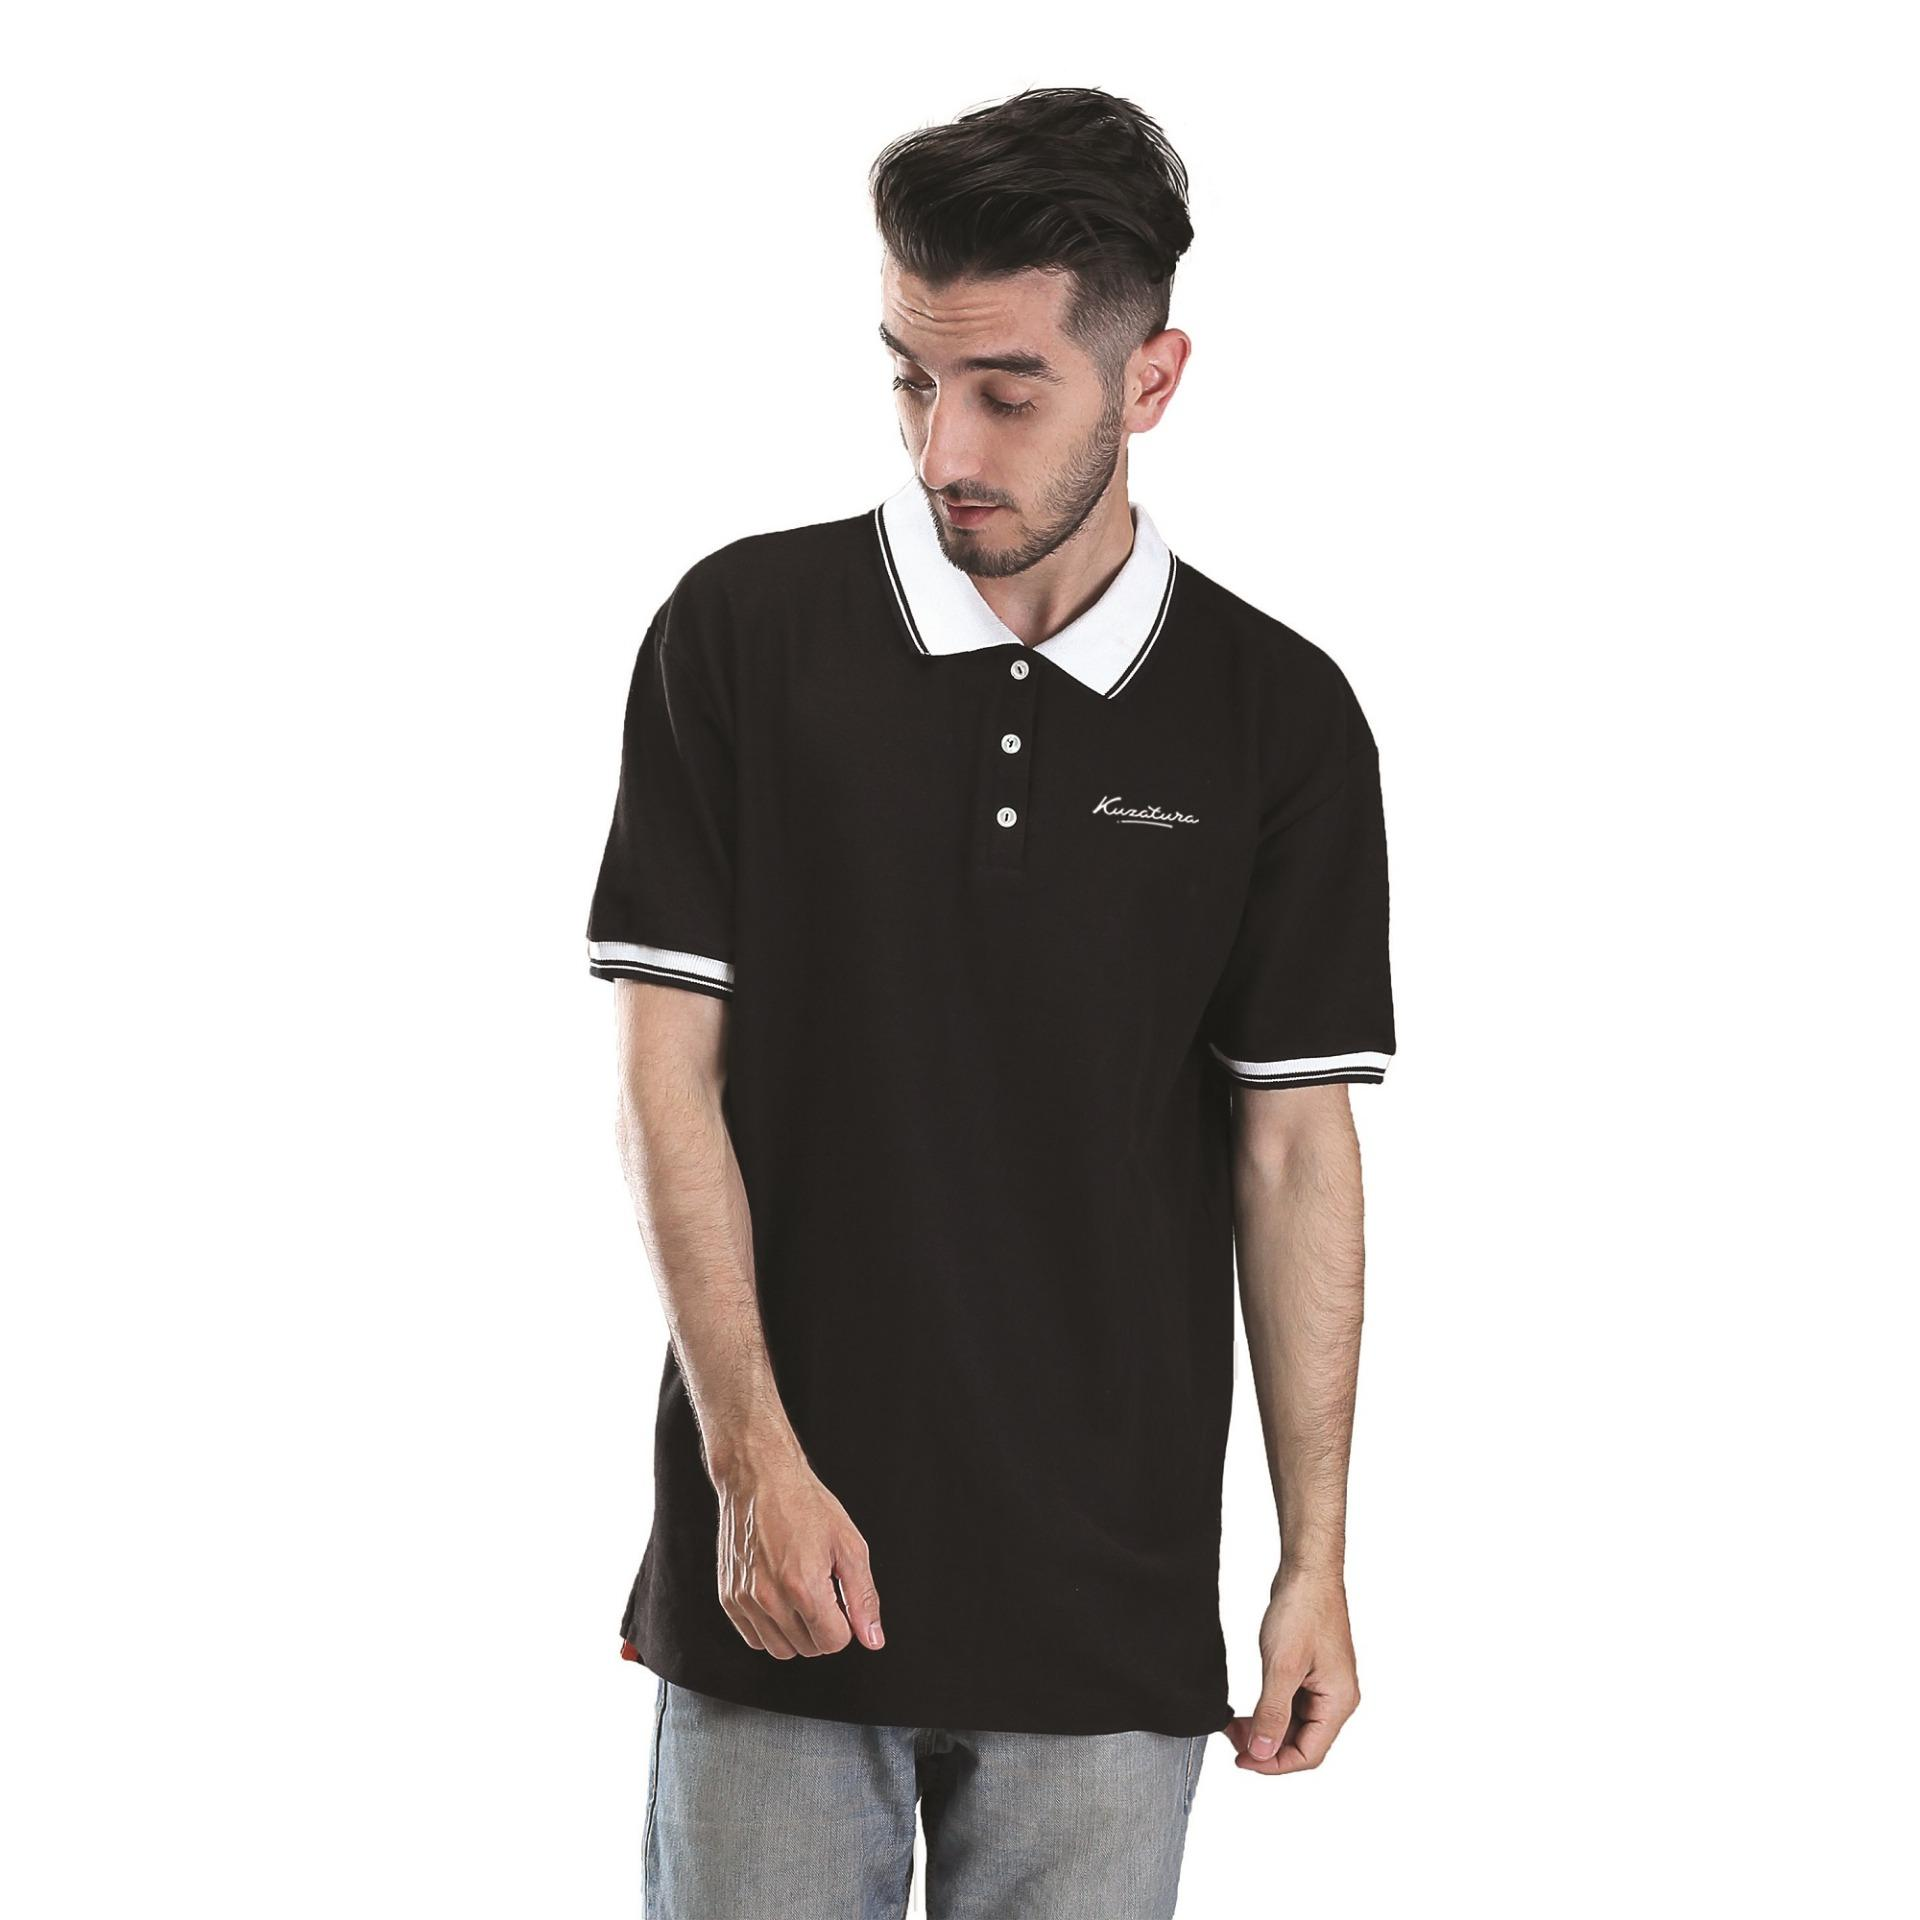 Kuzatura Kaos Polo T-Shirt Pria - bahan Not spesified Murah & Berkualitas ( Hitam